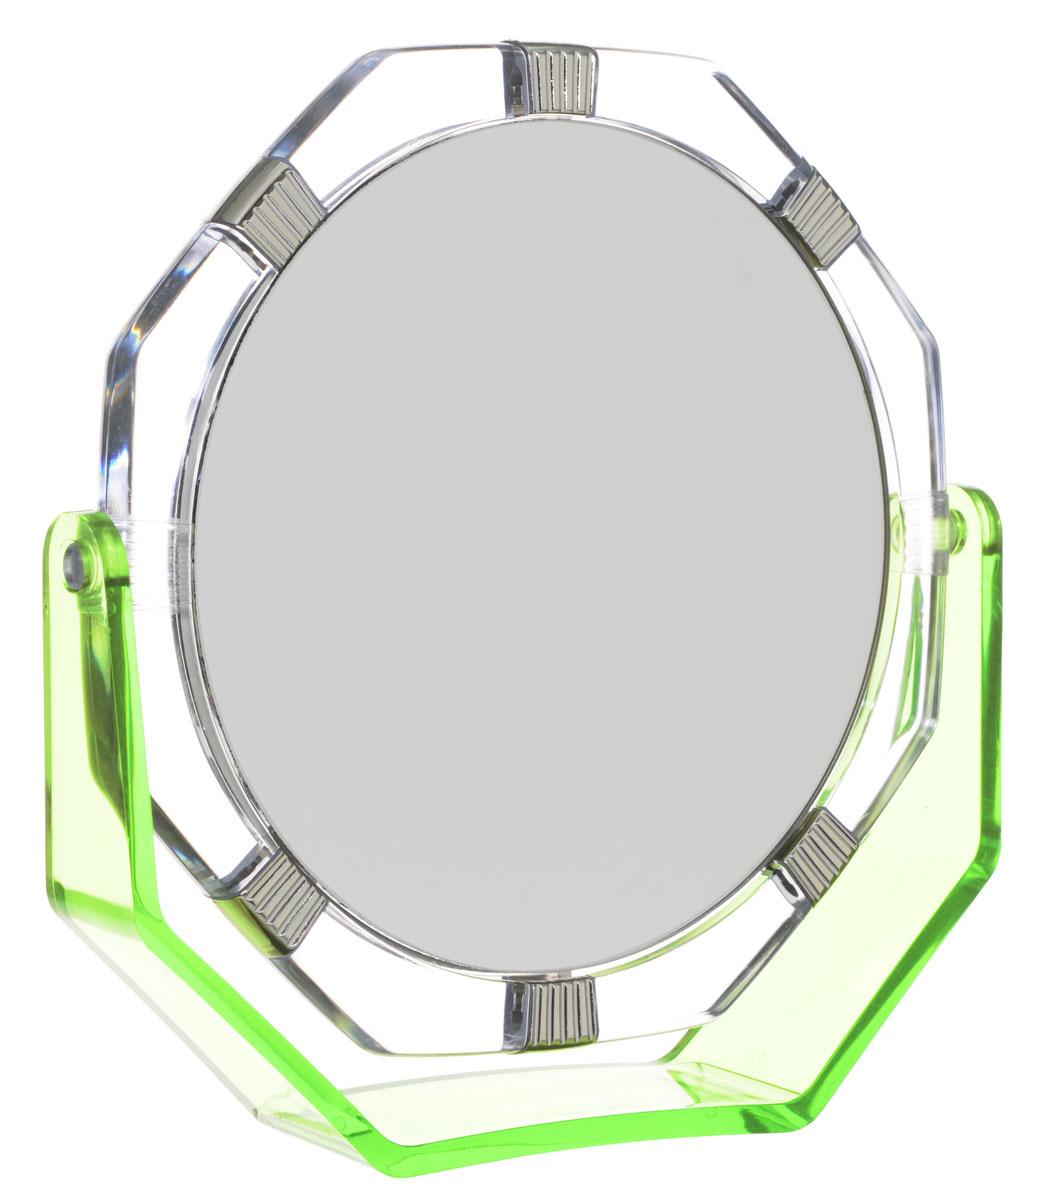 Зеркало Beiron 1138 настольное, двустороннее, d 17, 5см, x2RT1404Зеркало Beiron 1138 настольное, двустороннее, d 17, 5см, x2